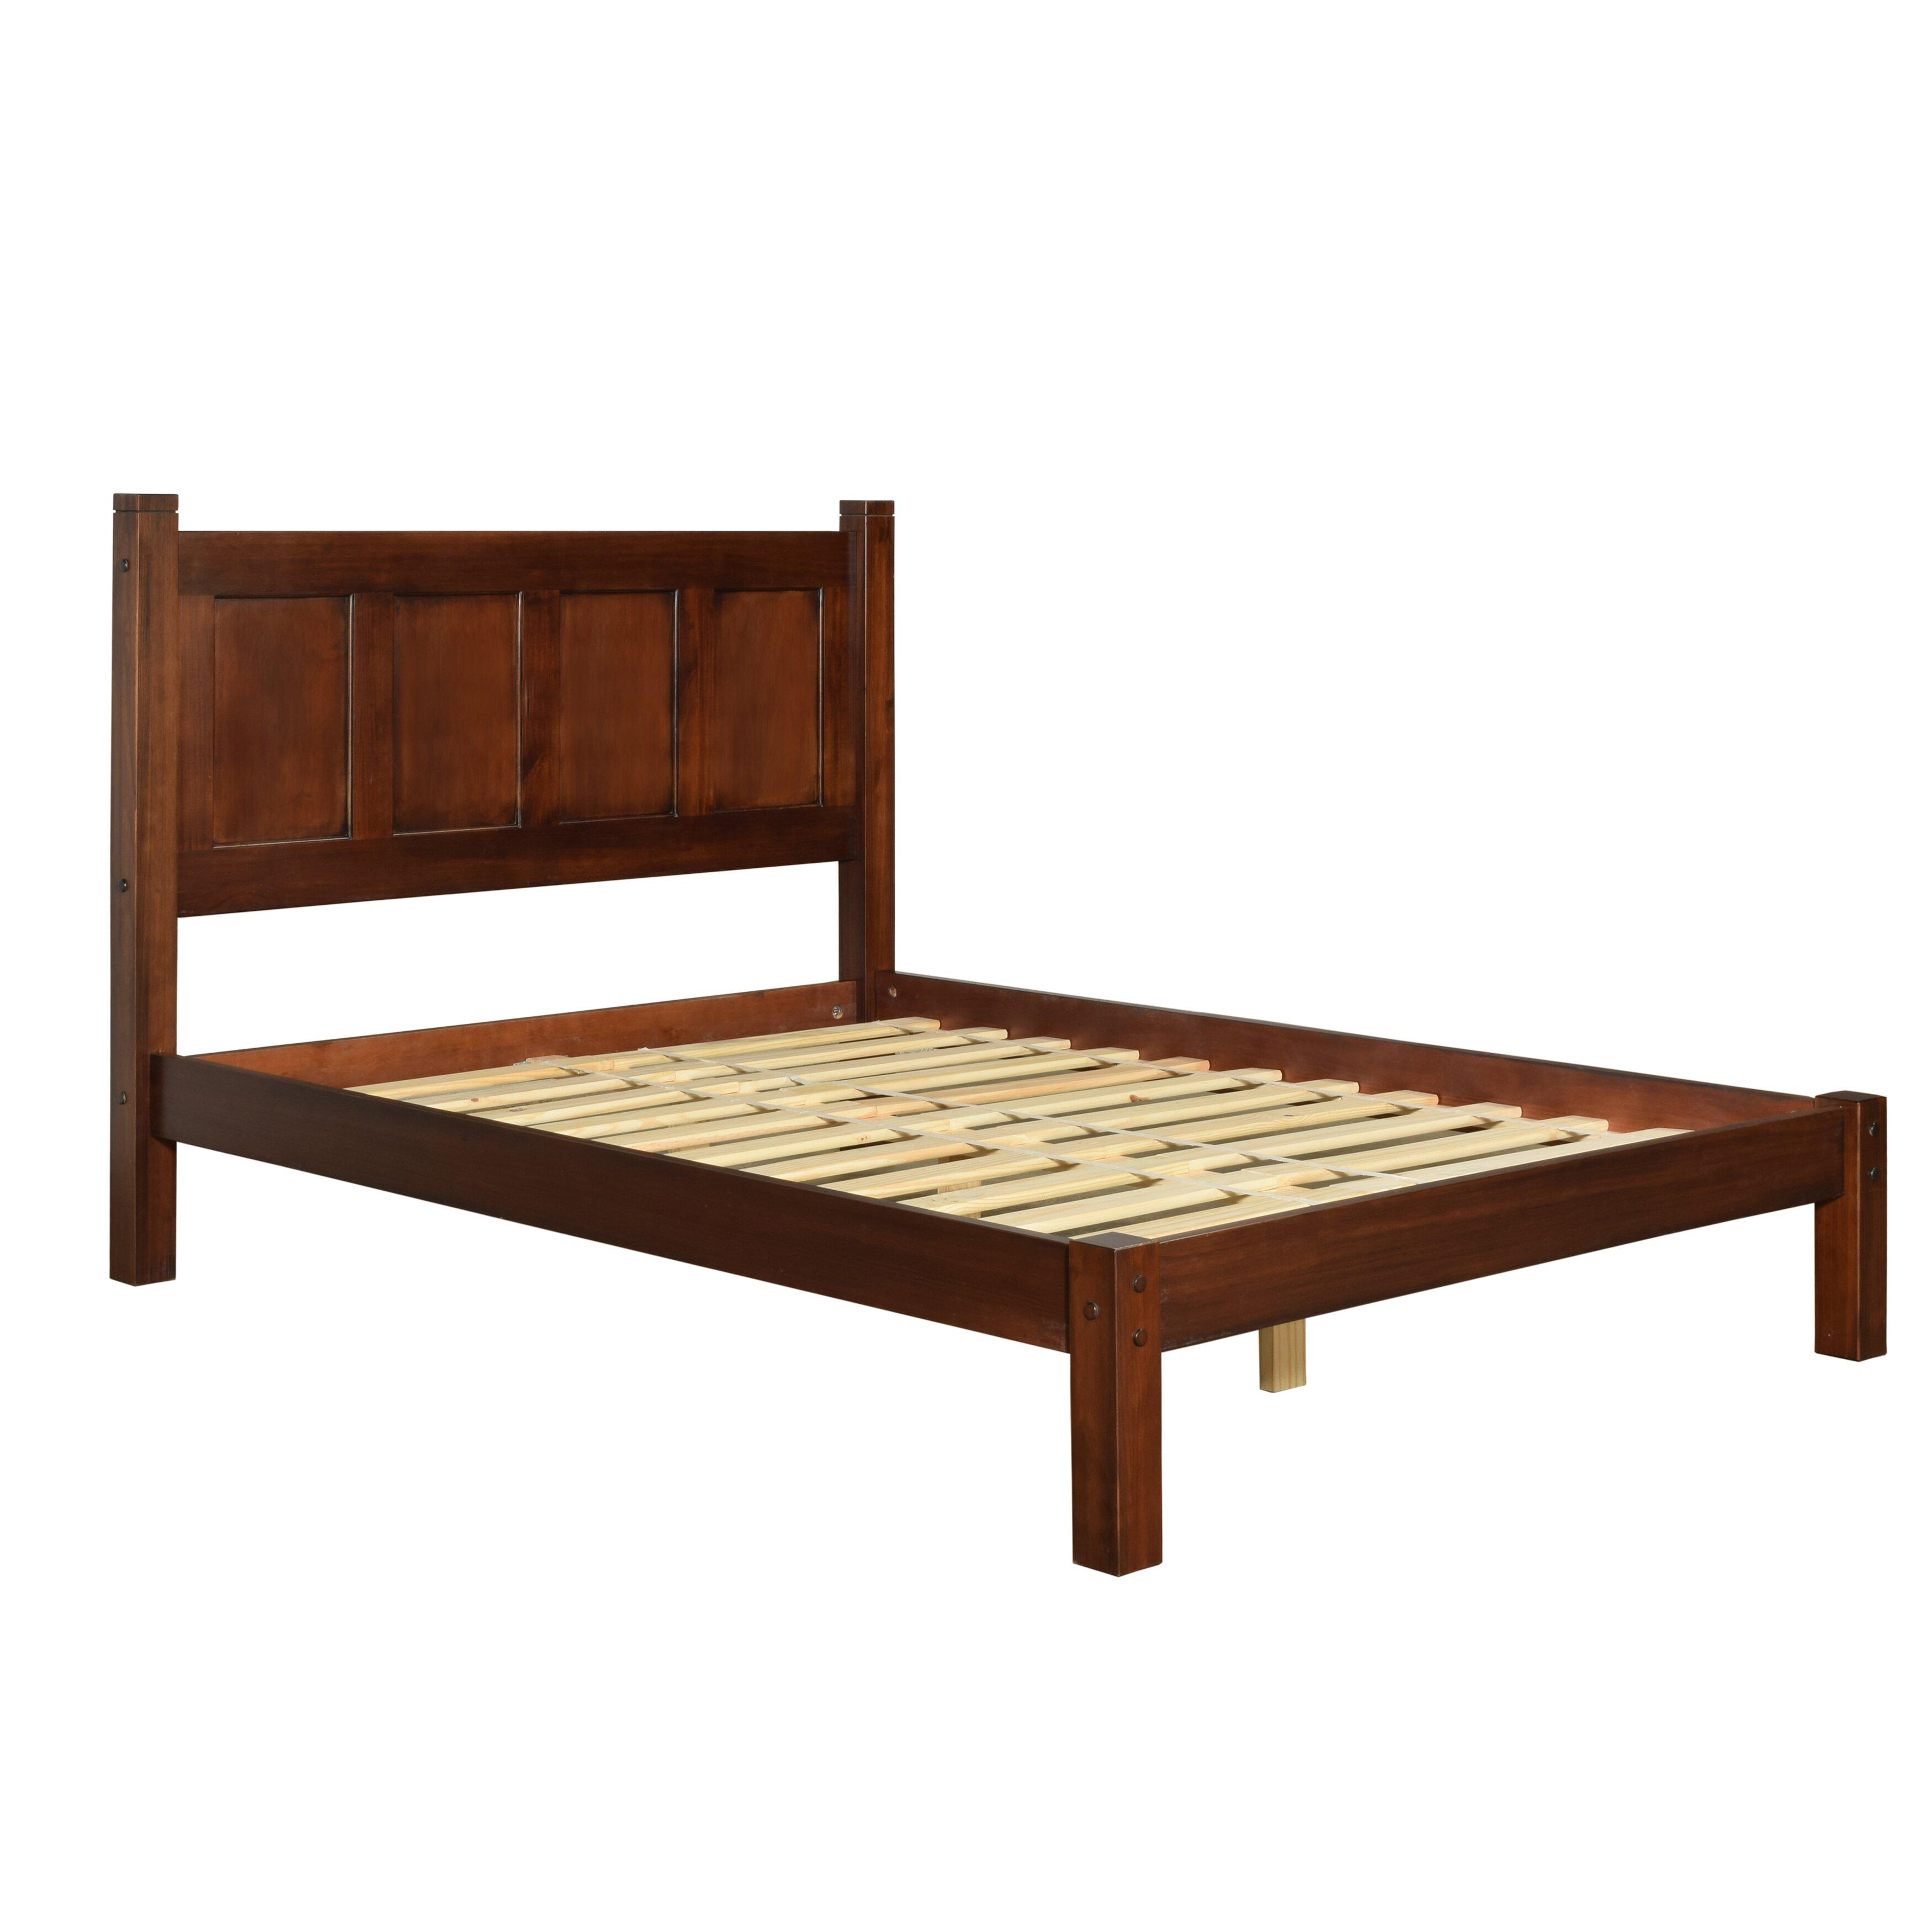 Grain wood furniture shaker platform bed reviews wayfair for Bed in furniture